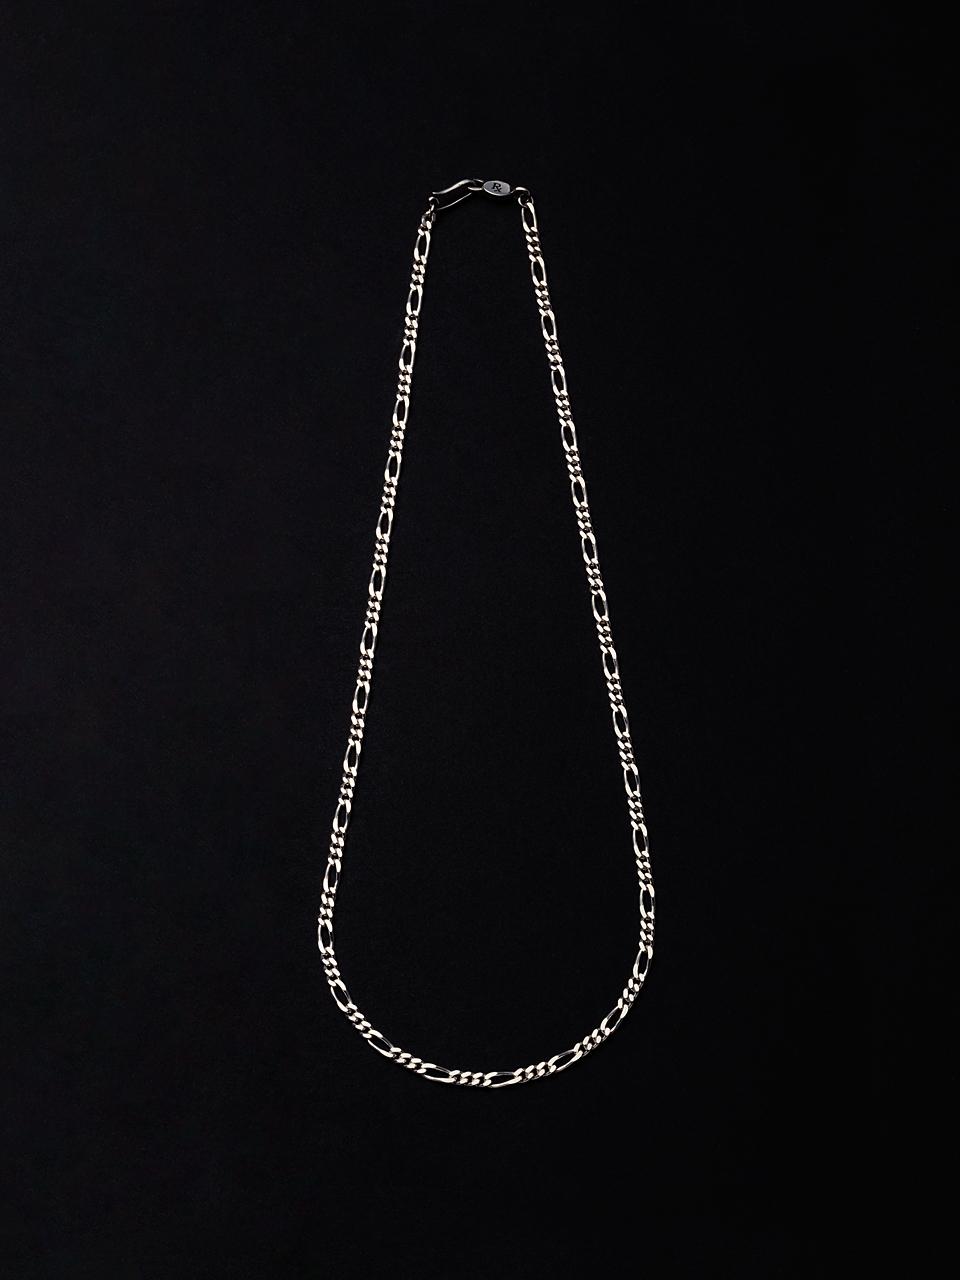 ANTIDOTE BUYERS CLUB Figaro Chain(L)